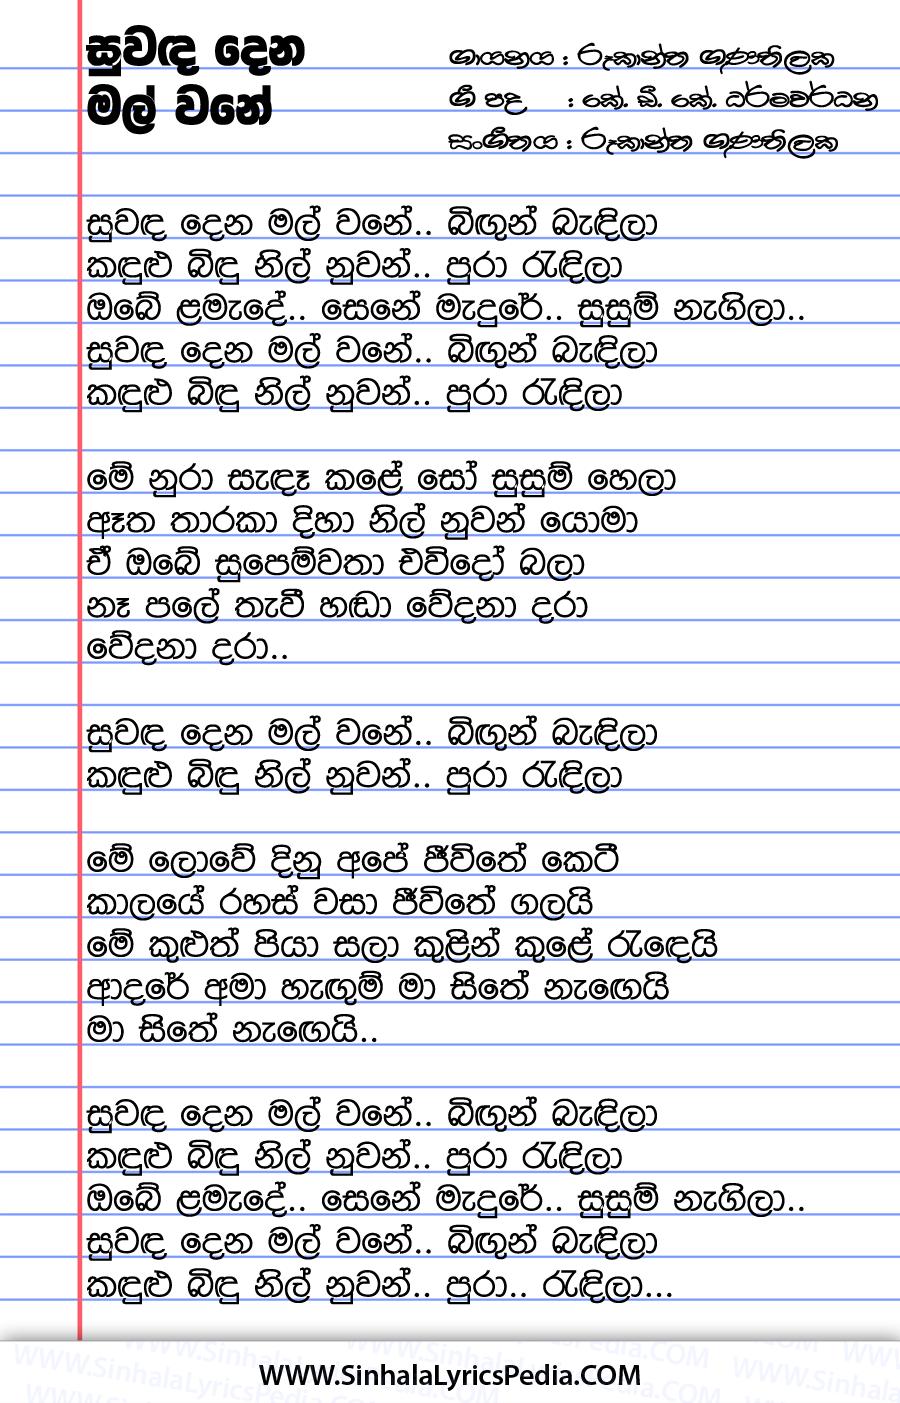 Suwanda Dena Mal Wane Song Lyrics